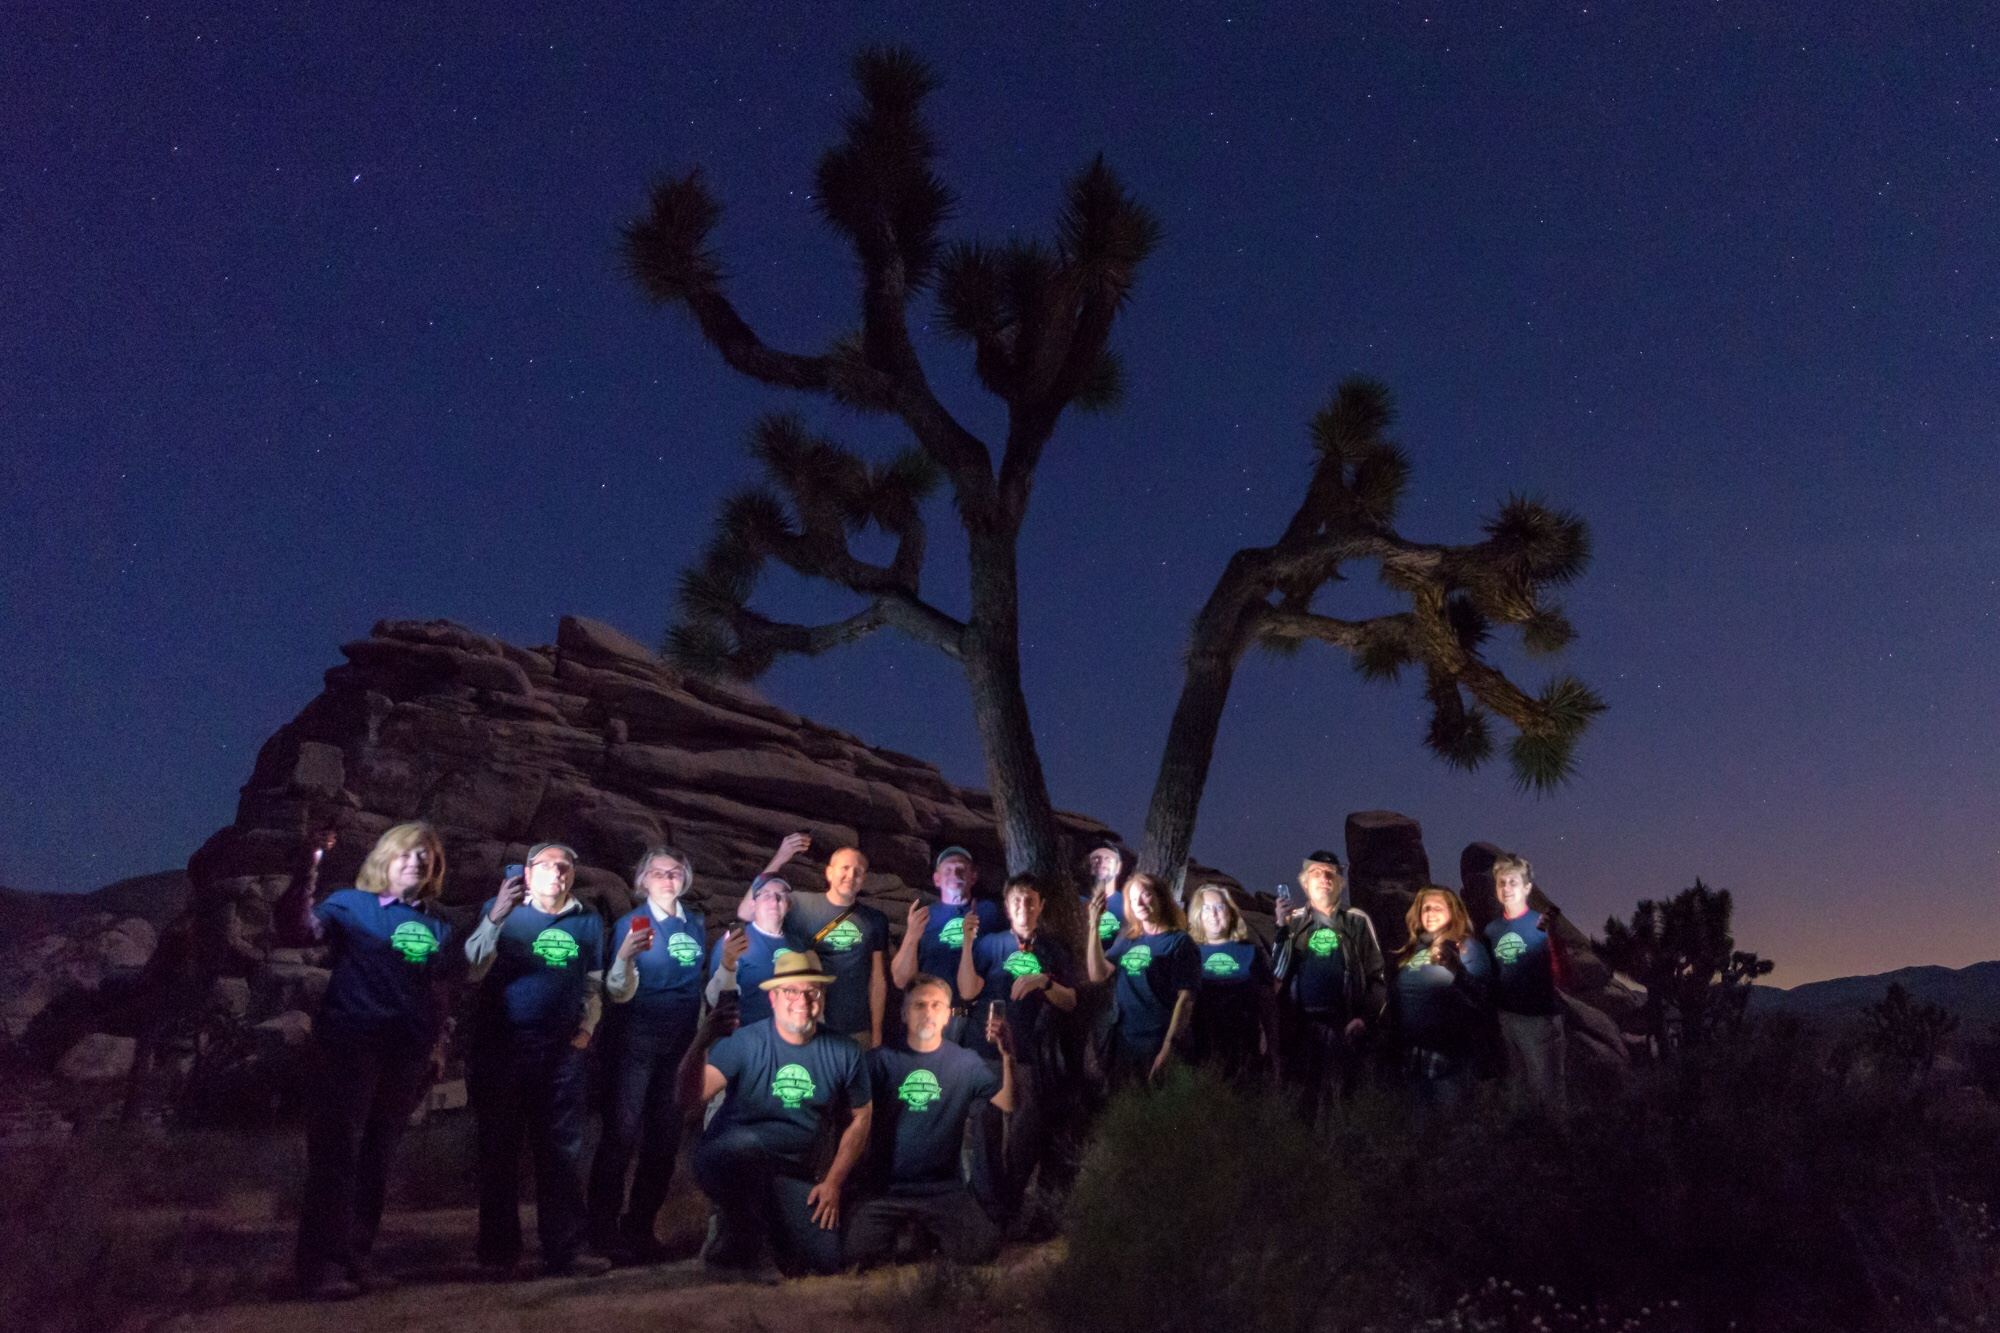 The Joshua Tree Week 2 group